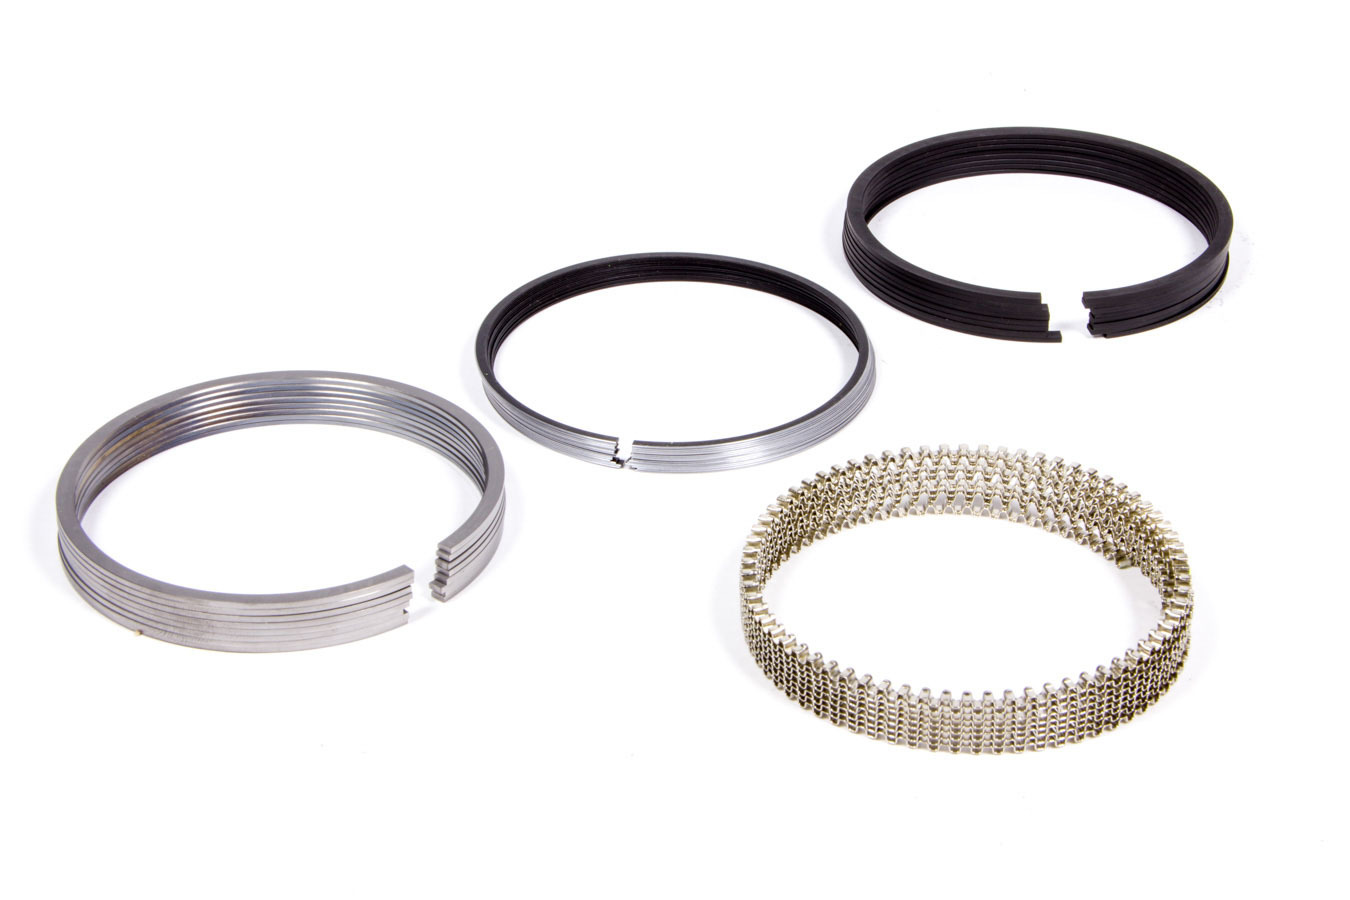 Pro-Select Ring Set - 3.572 1.5 1.5 3mm